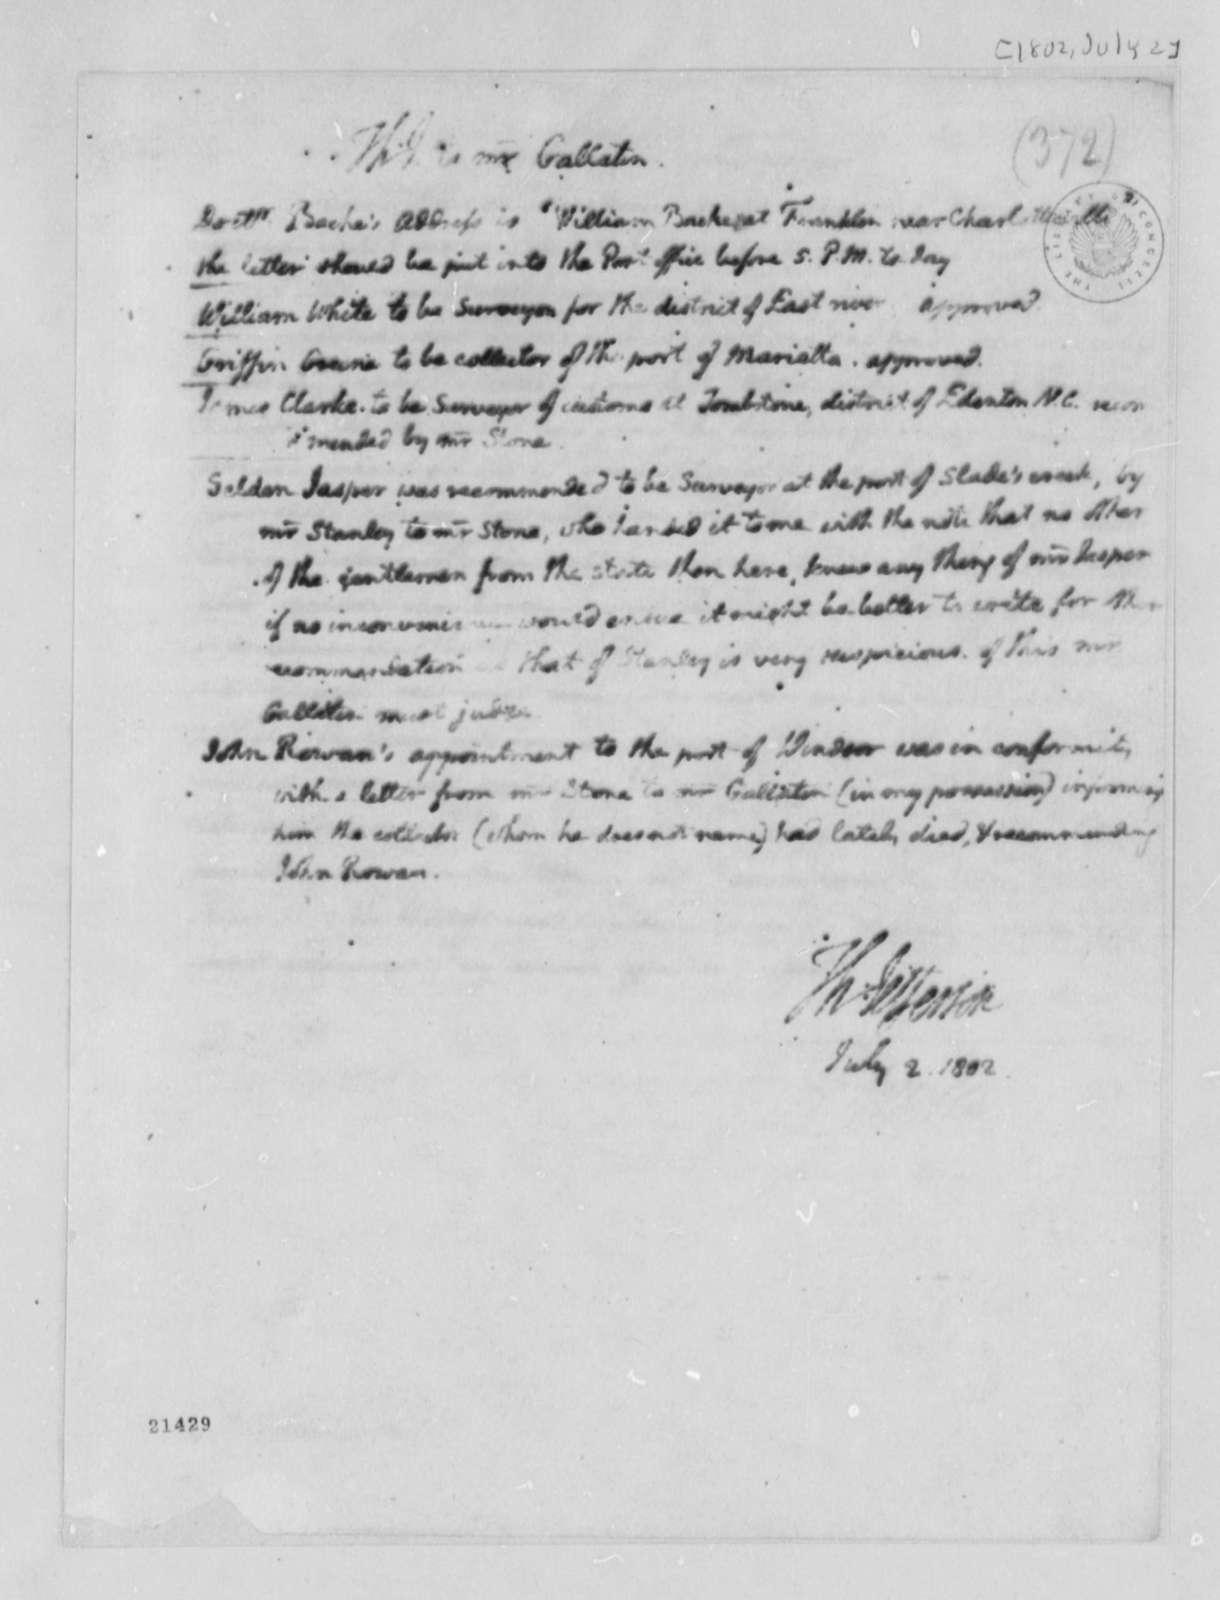 Thomas Jefferson to Albert Gallatin, July 2, 1802